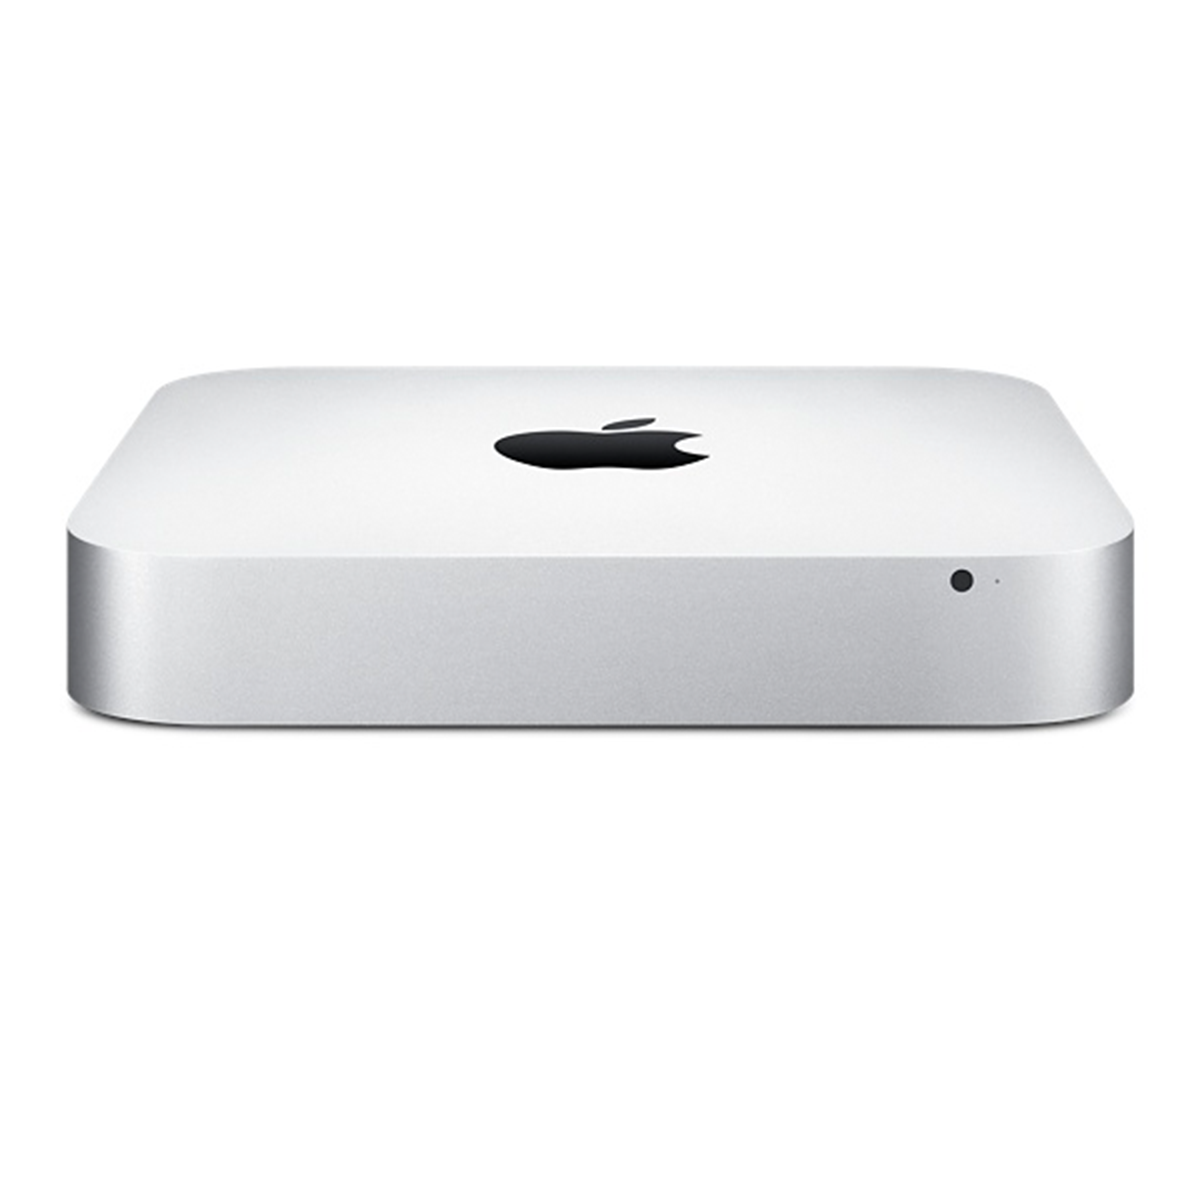 Mac Mini i5 2.5Ghz 16gb 512gb SSD MD387LL/A Recertificado